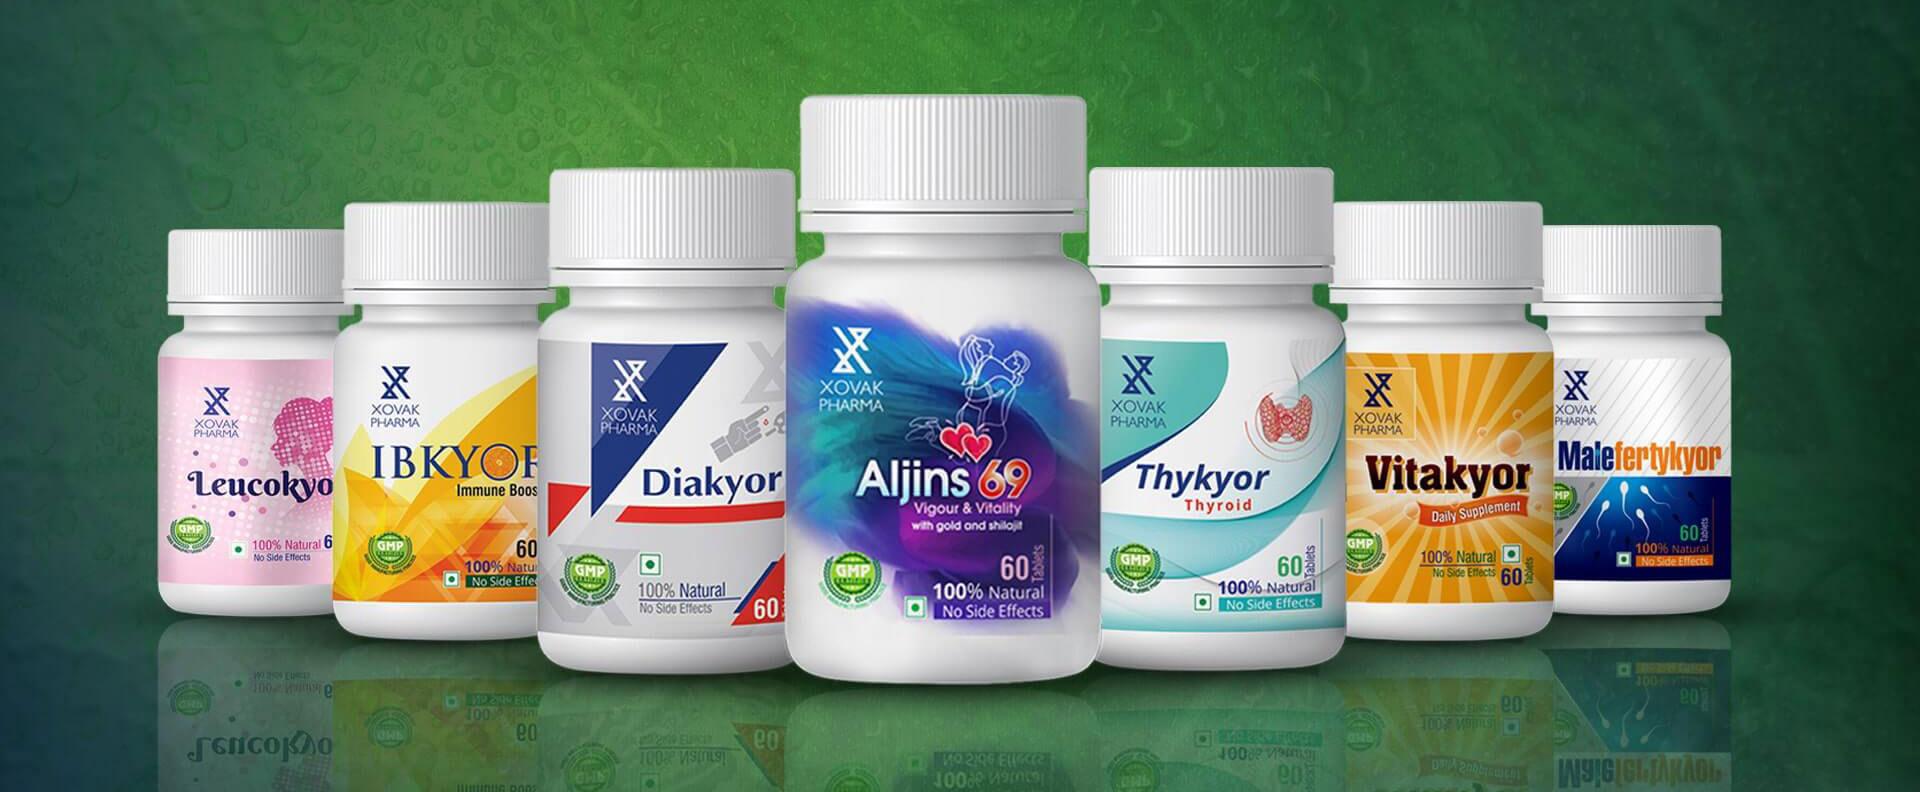 Xovak Pharma Products lists